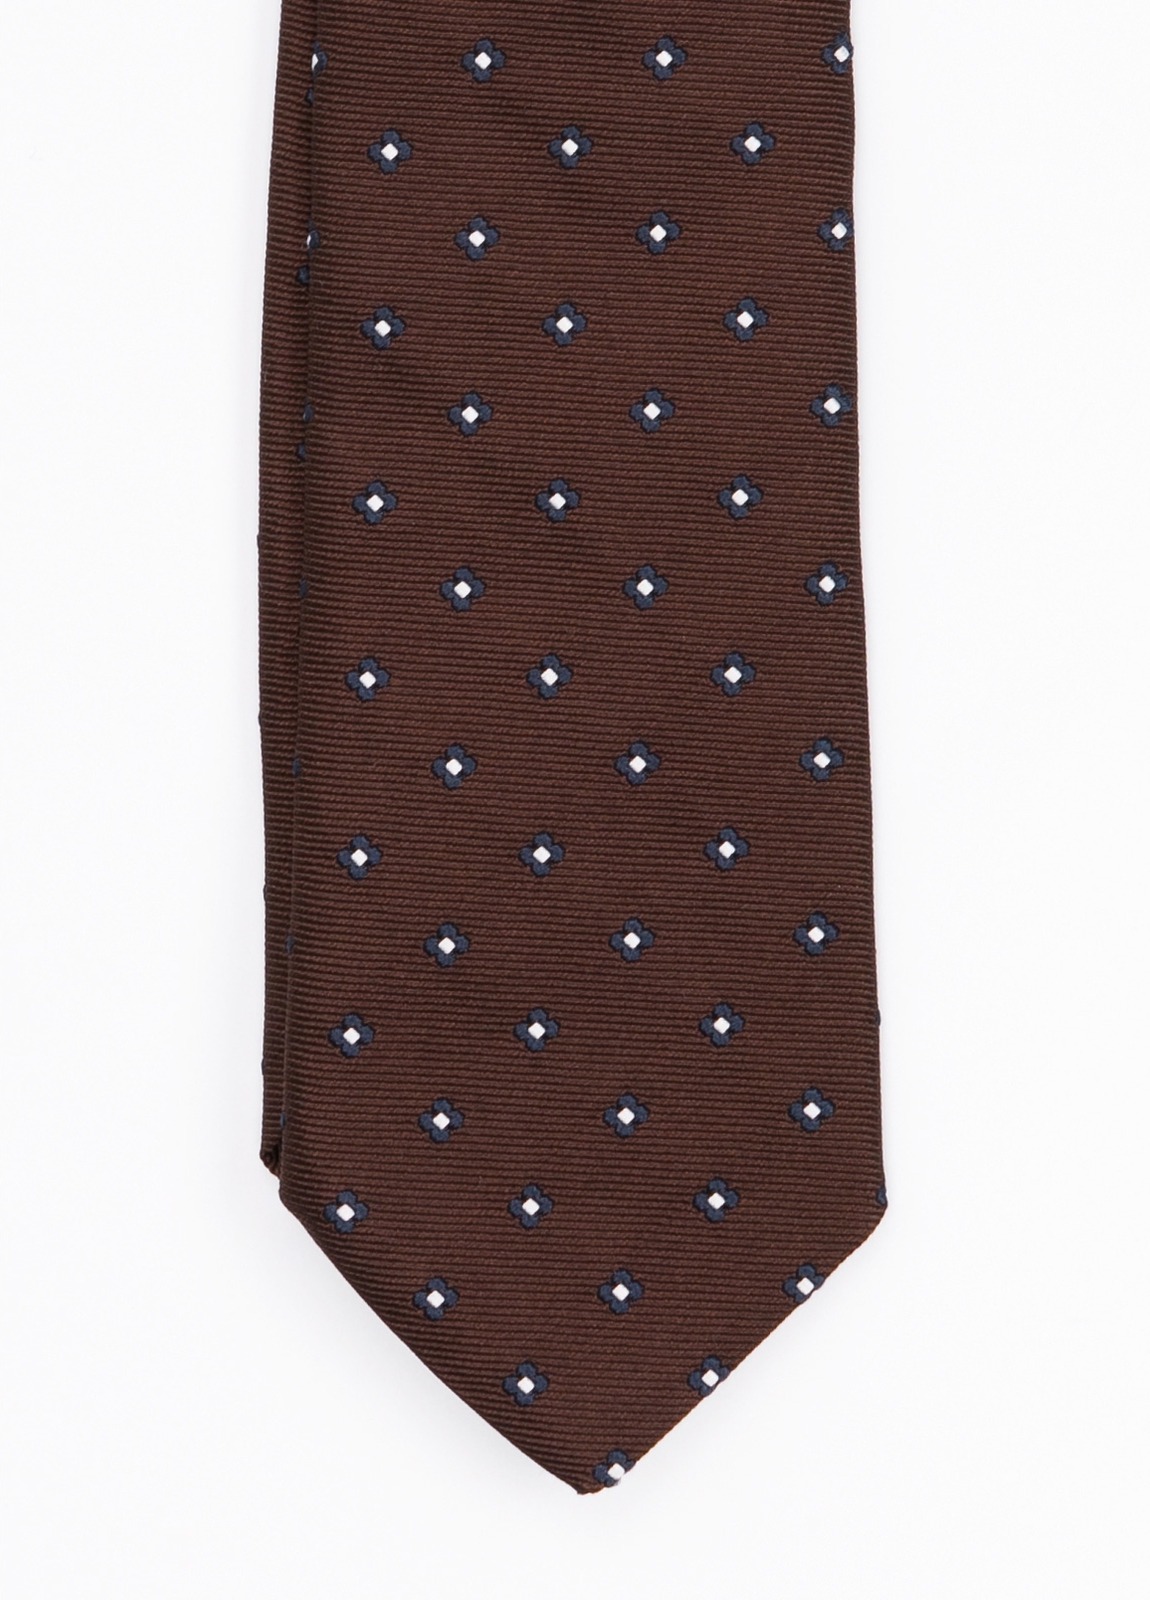 Corbata Formal Wear microdibujo flor, color marrón. pala 7,5 cm. Seda-Algodón. - Ítem1